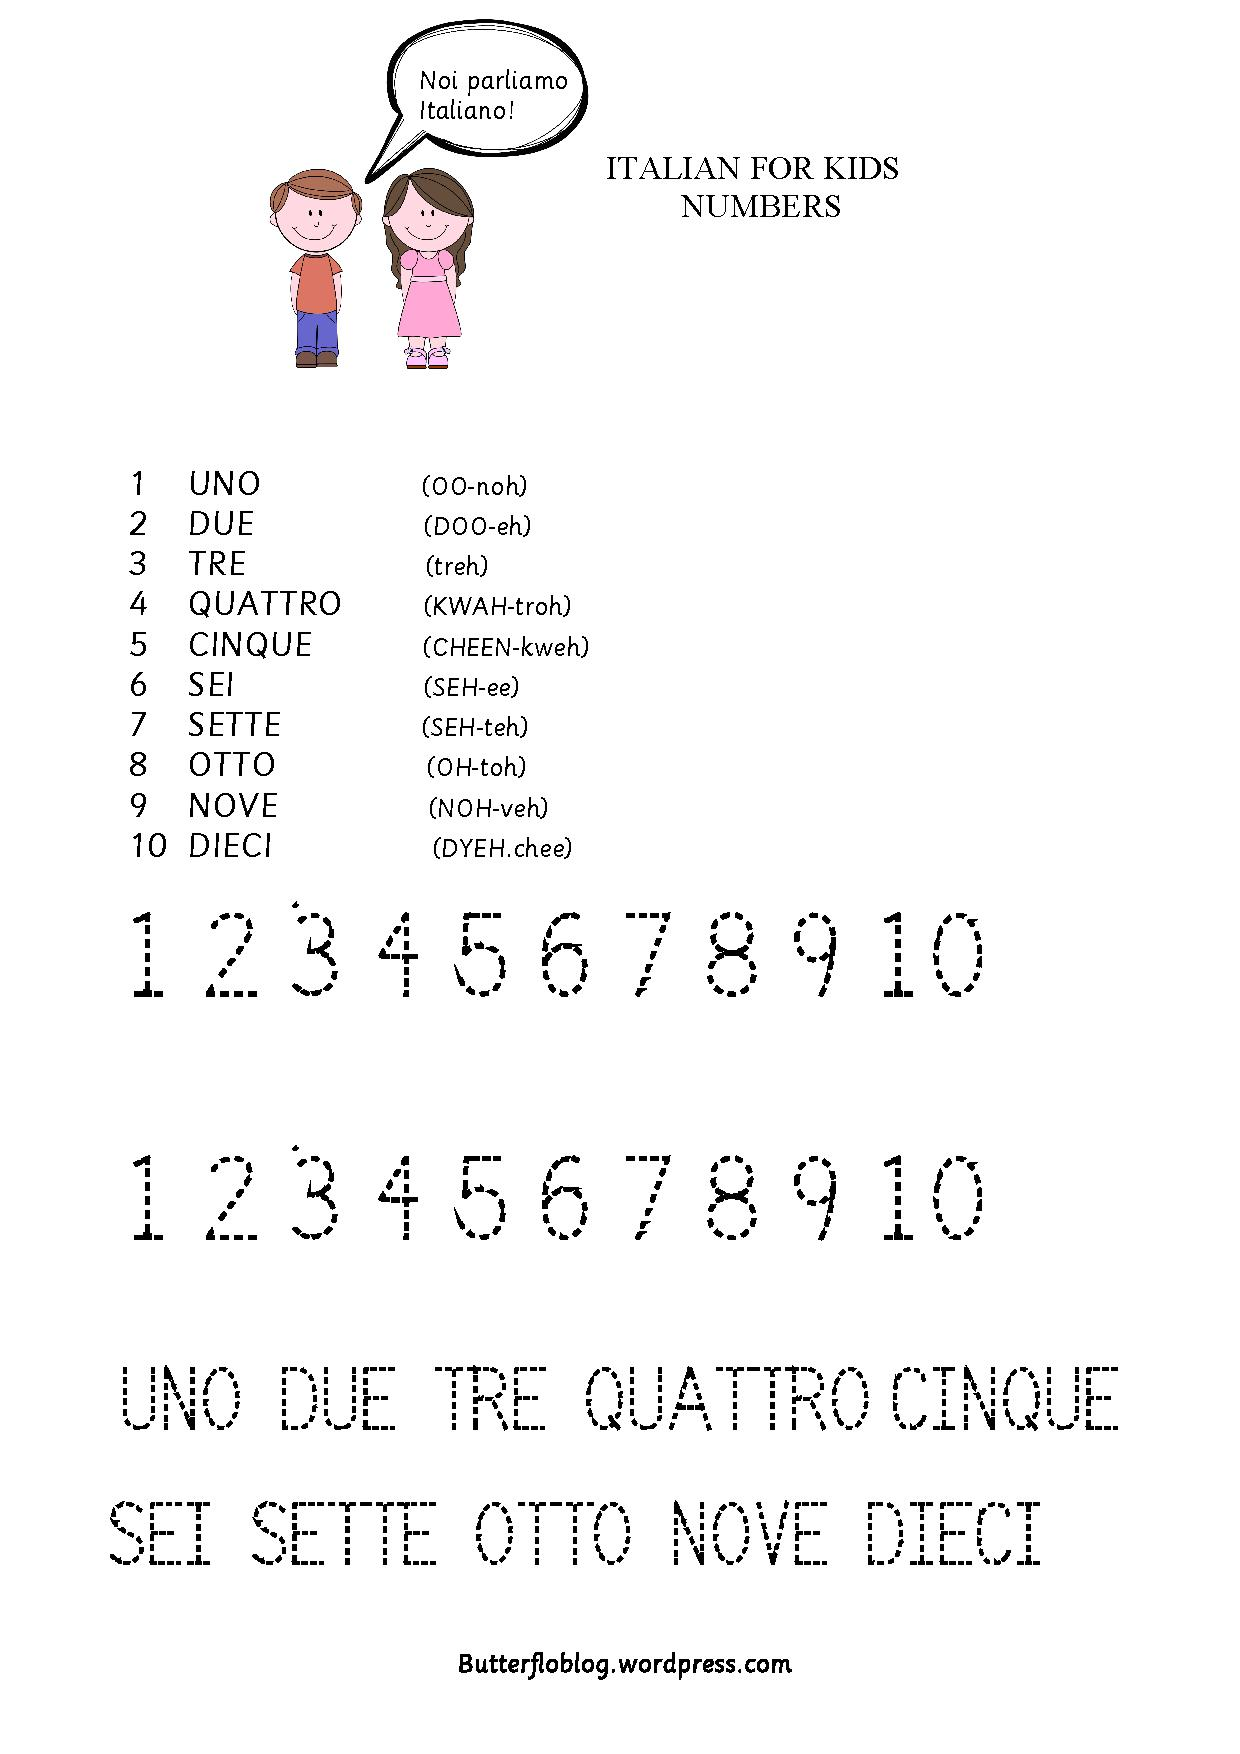 ITALIAN FOR KIDS NUMBERS